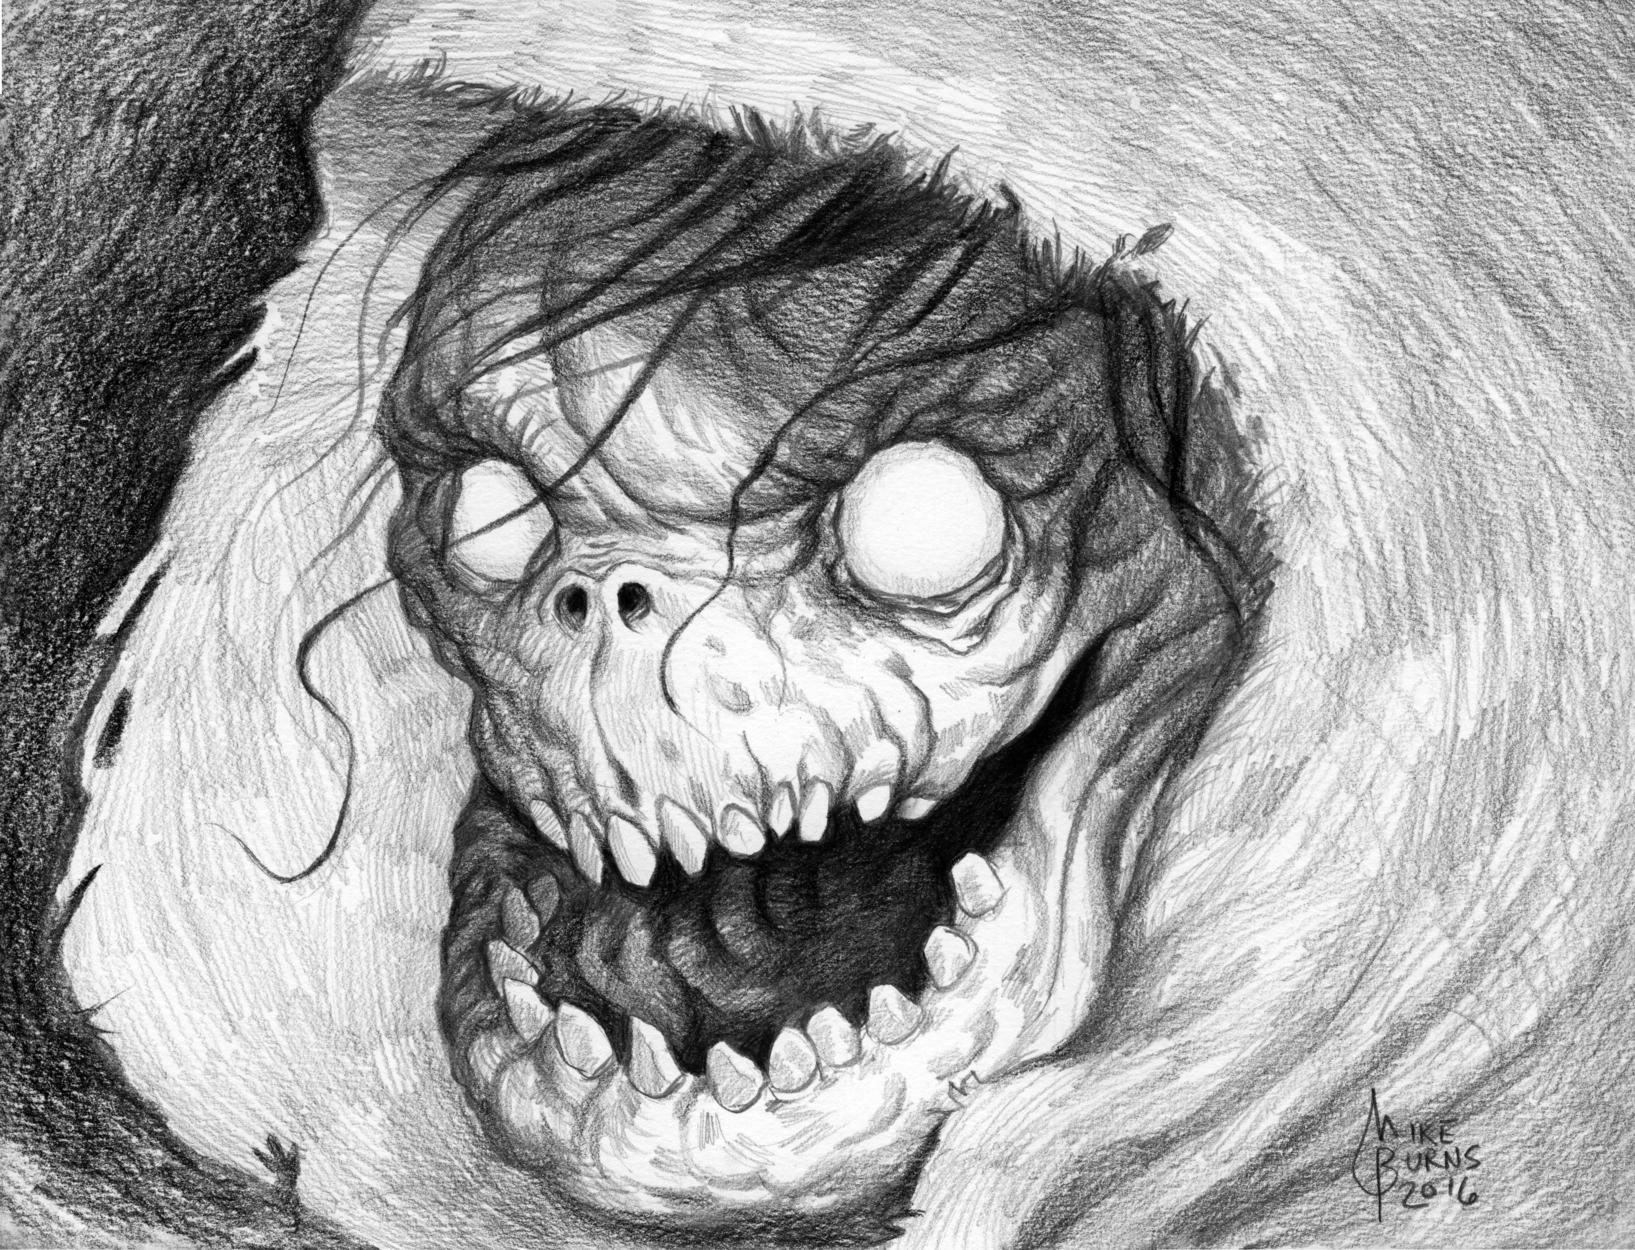 Hooded Hellbringer Artwork by Mike Burns